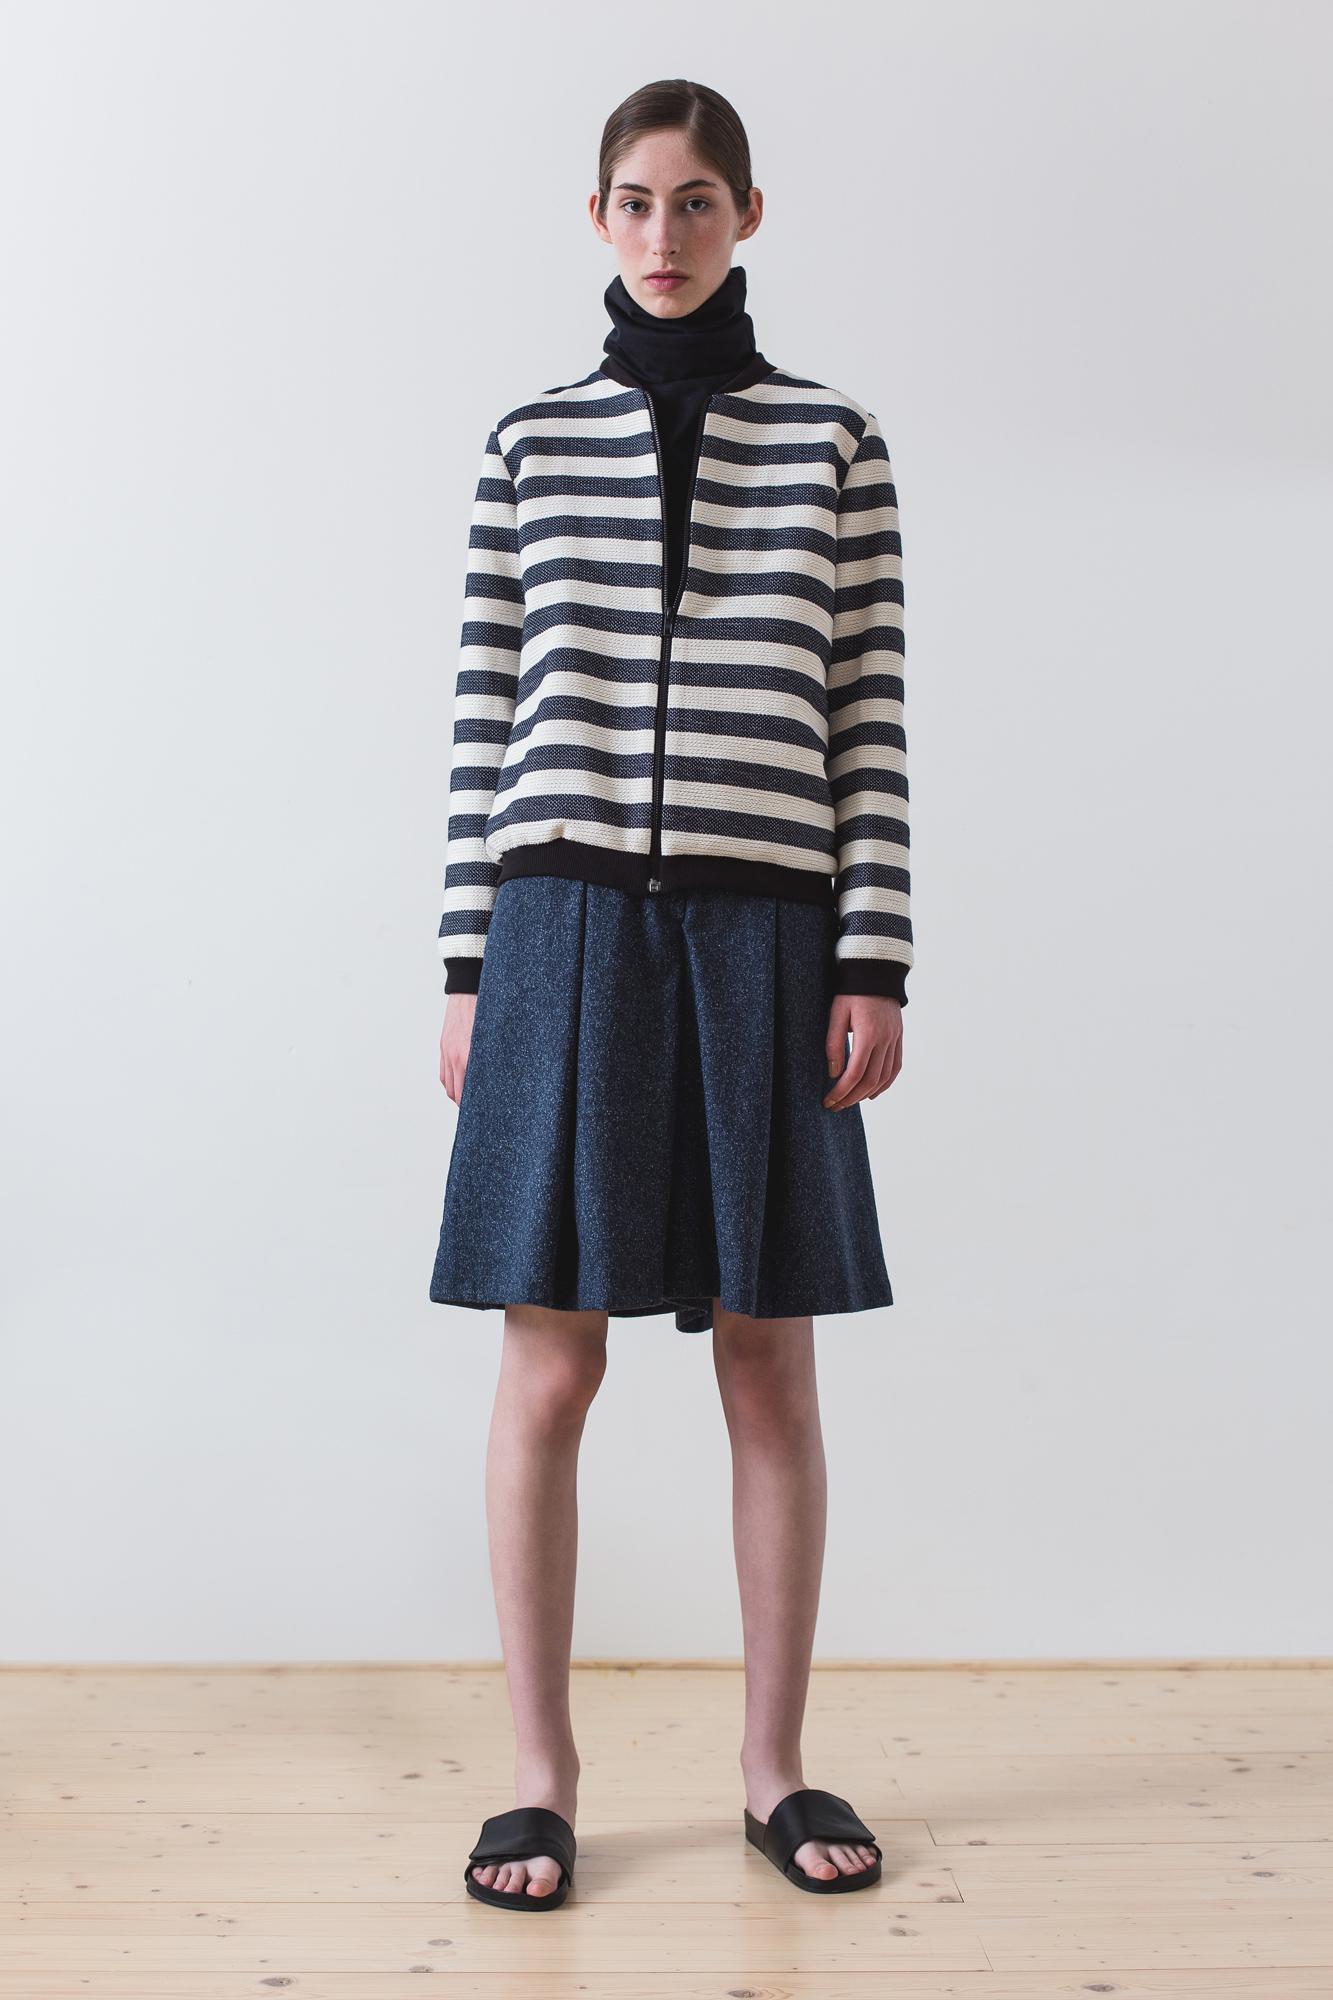 wearenotsisters_wrns_contour-jacket_07